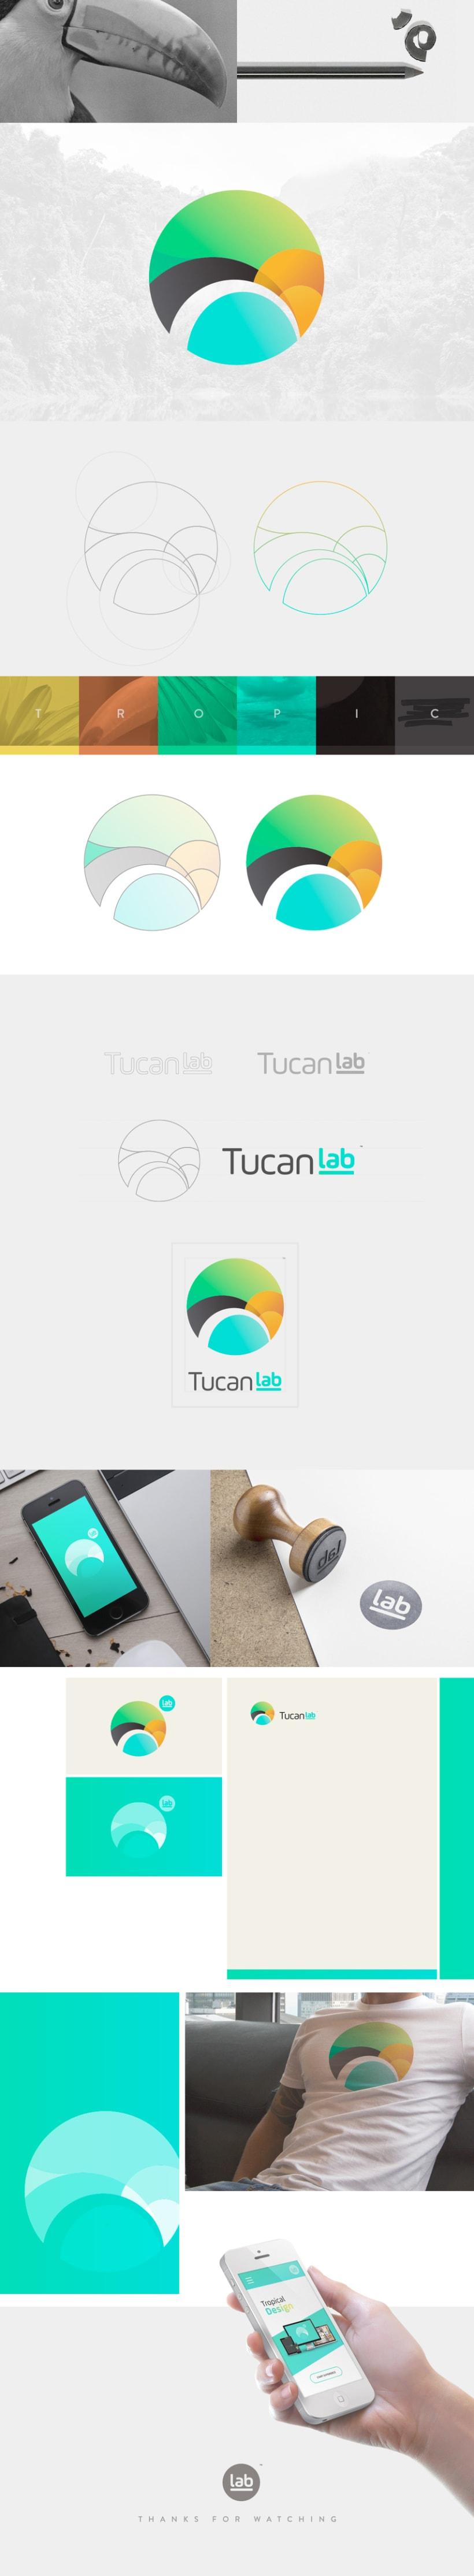 TucanLab ® -1